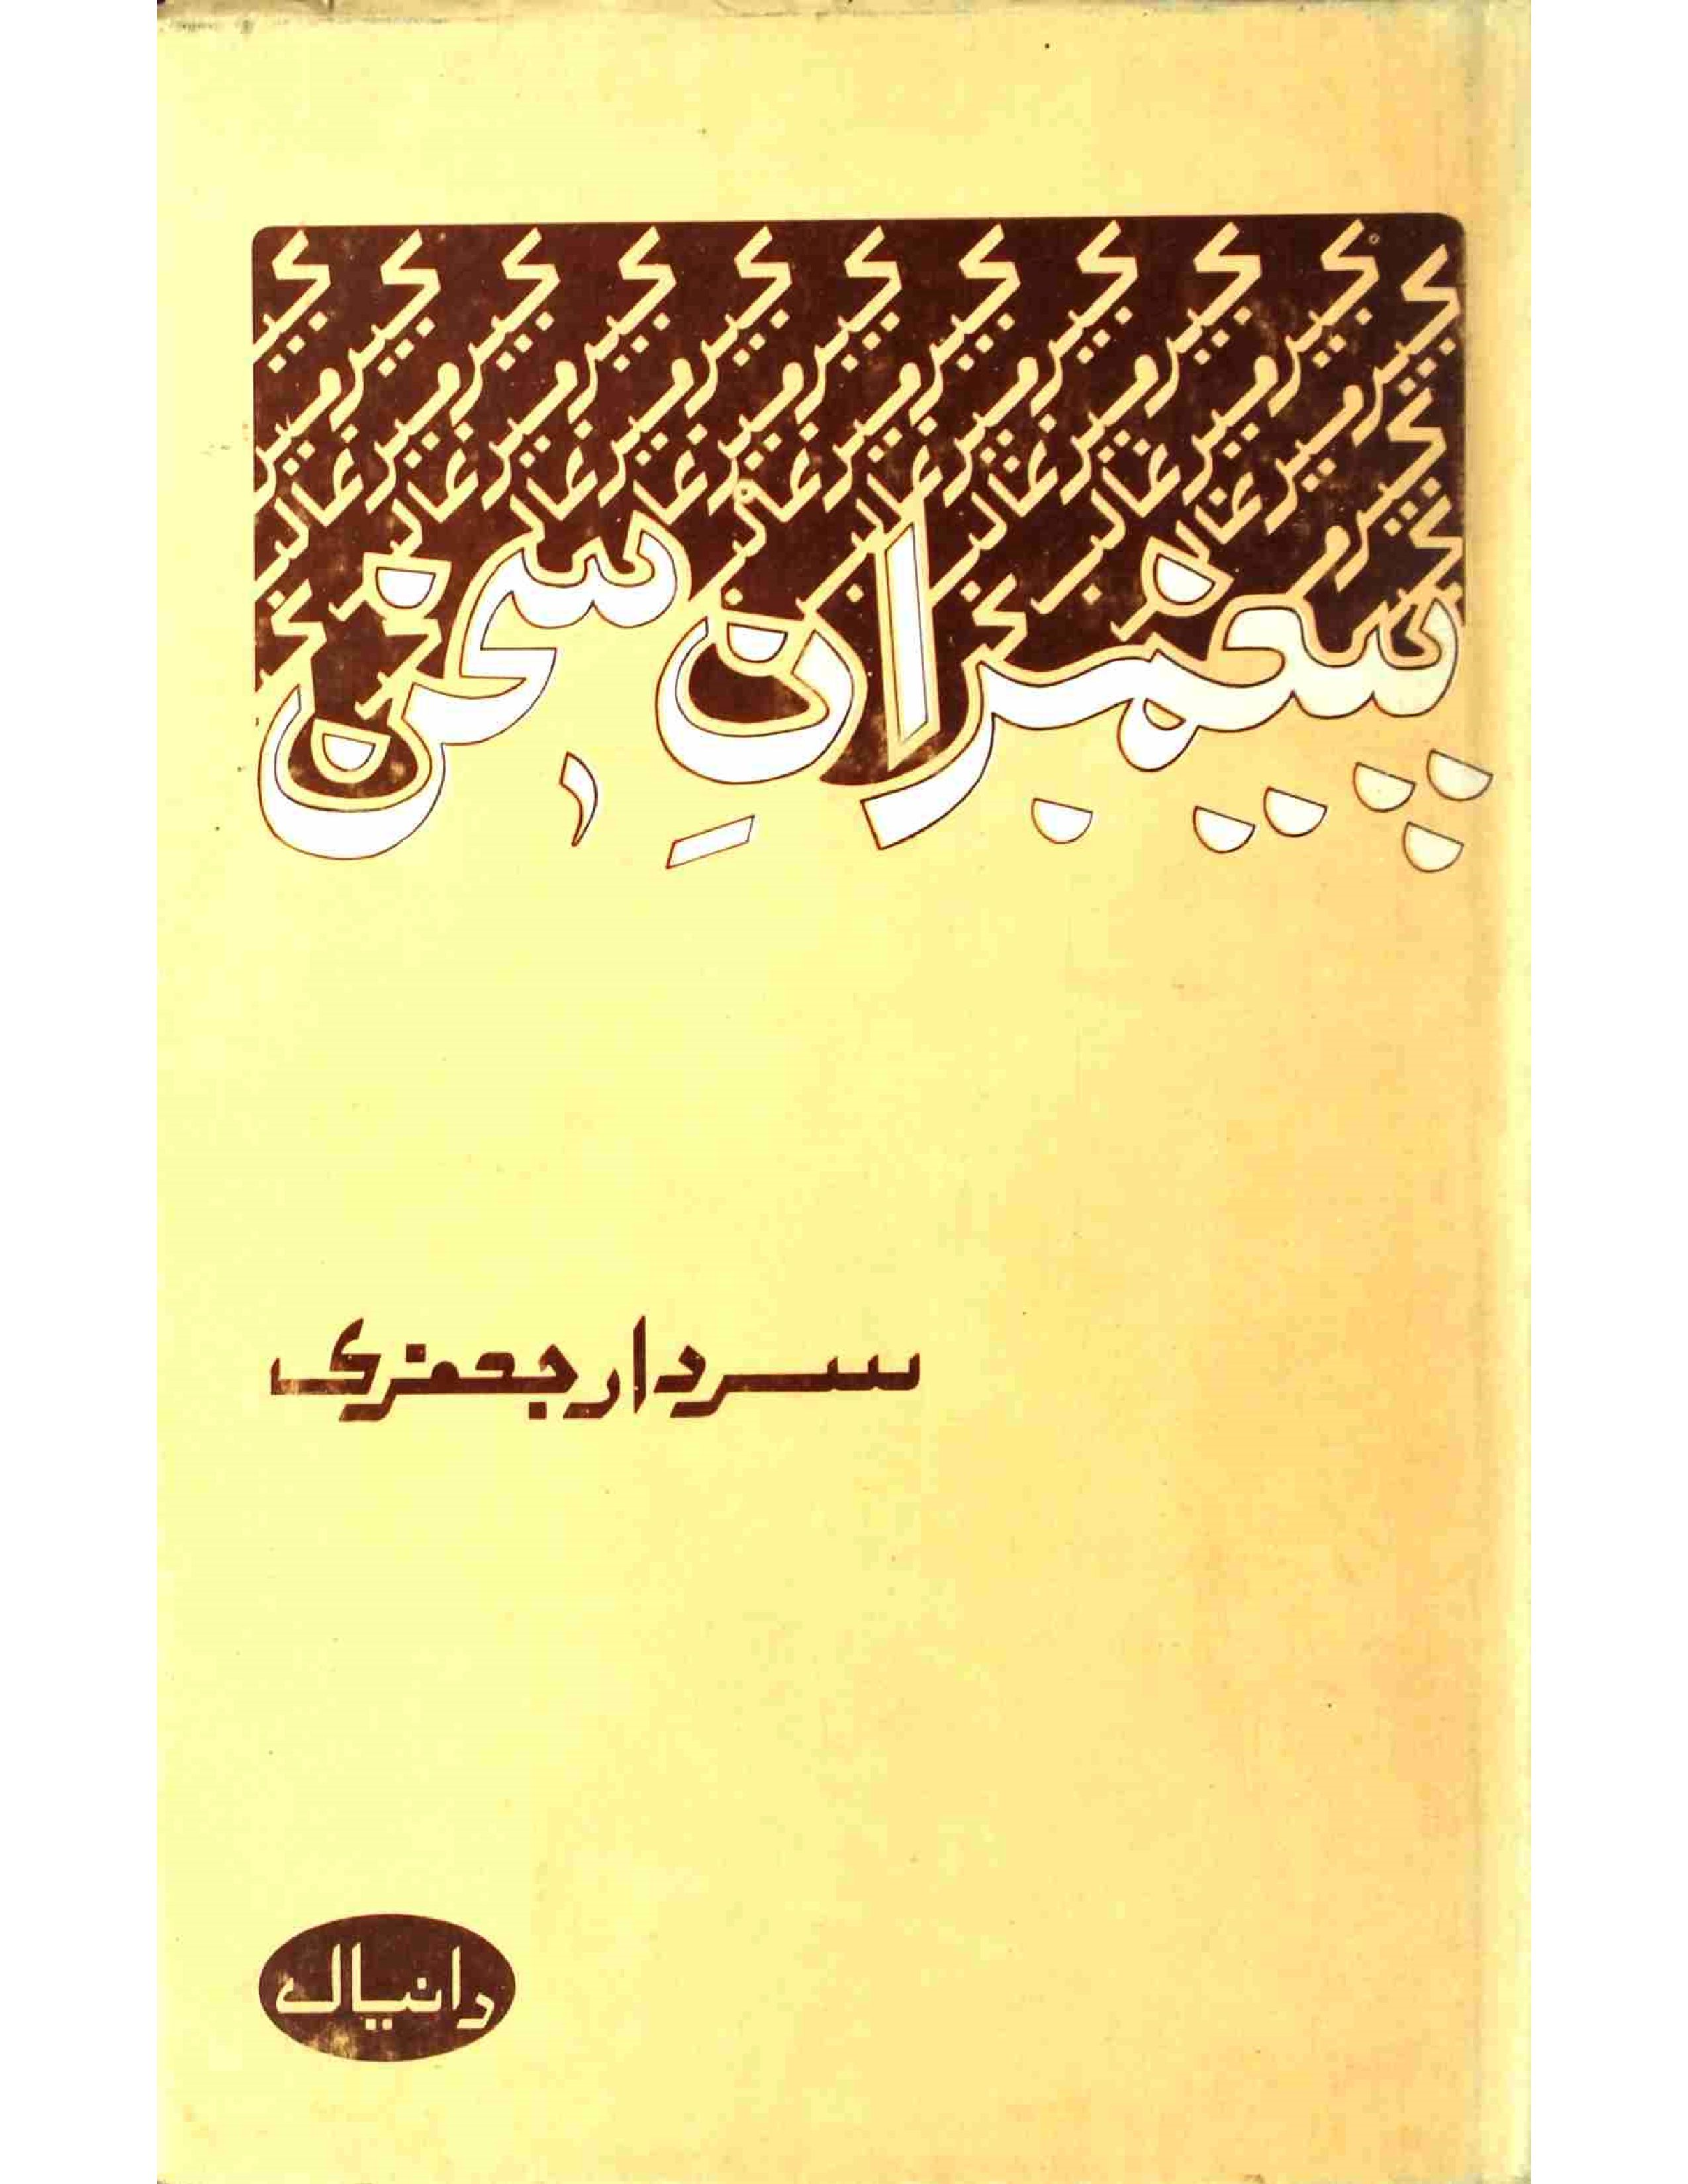 Paighambaran-e-Sukhan     Kabir,Meer Aur Ghaalib